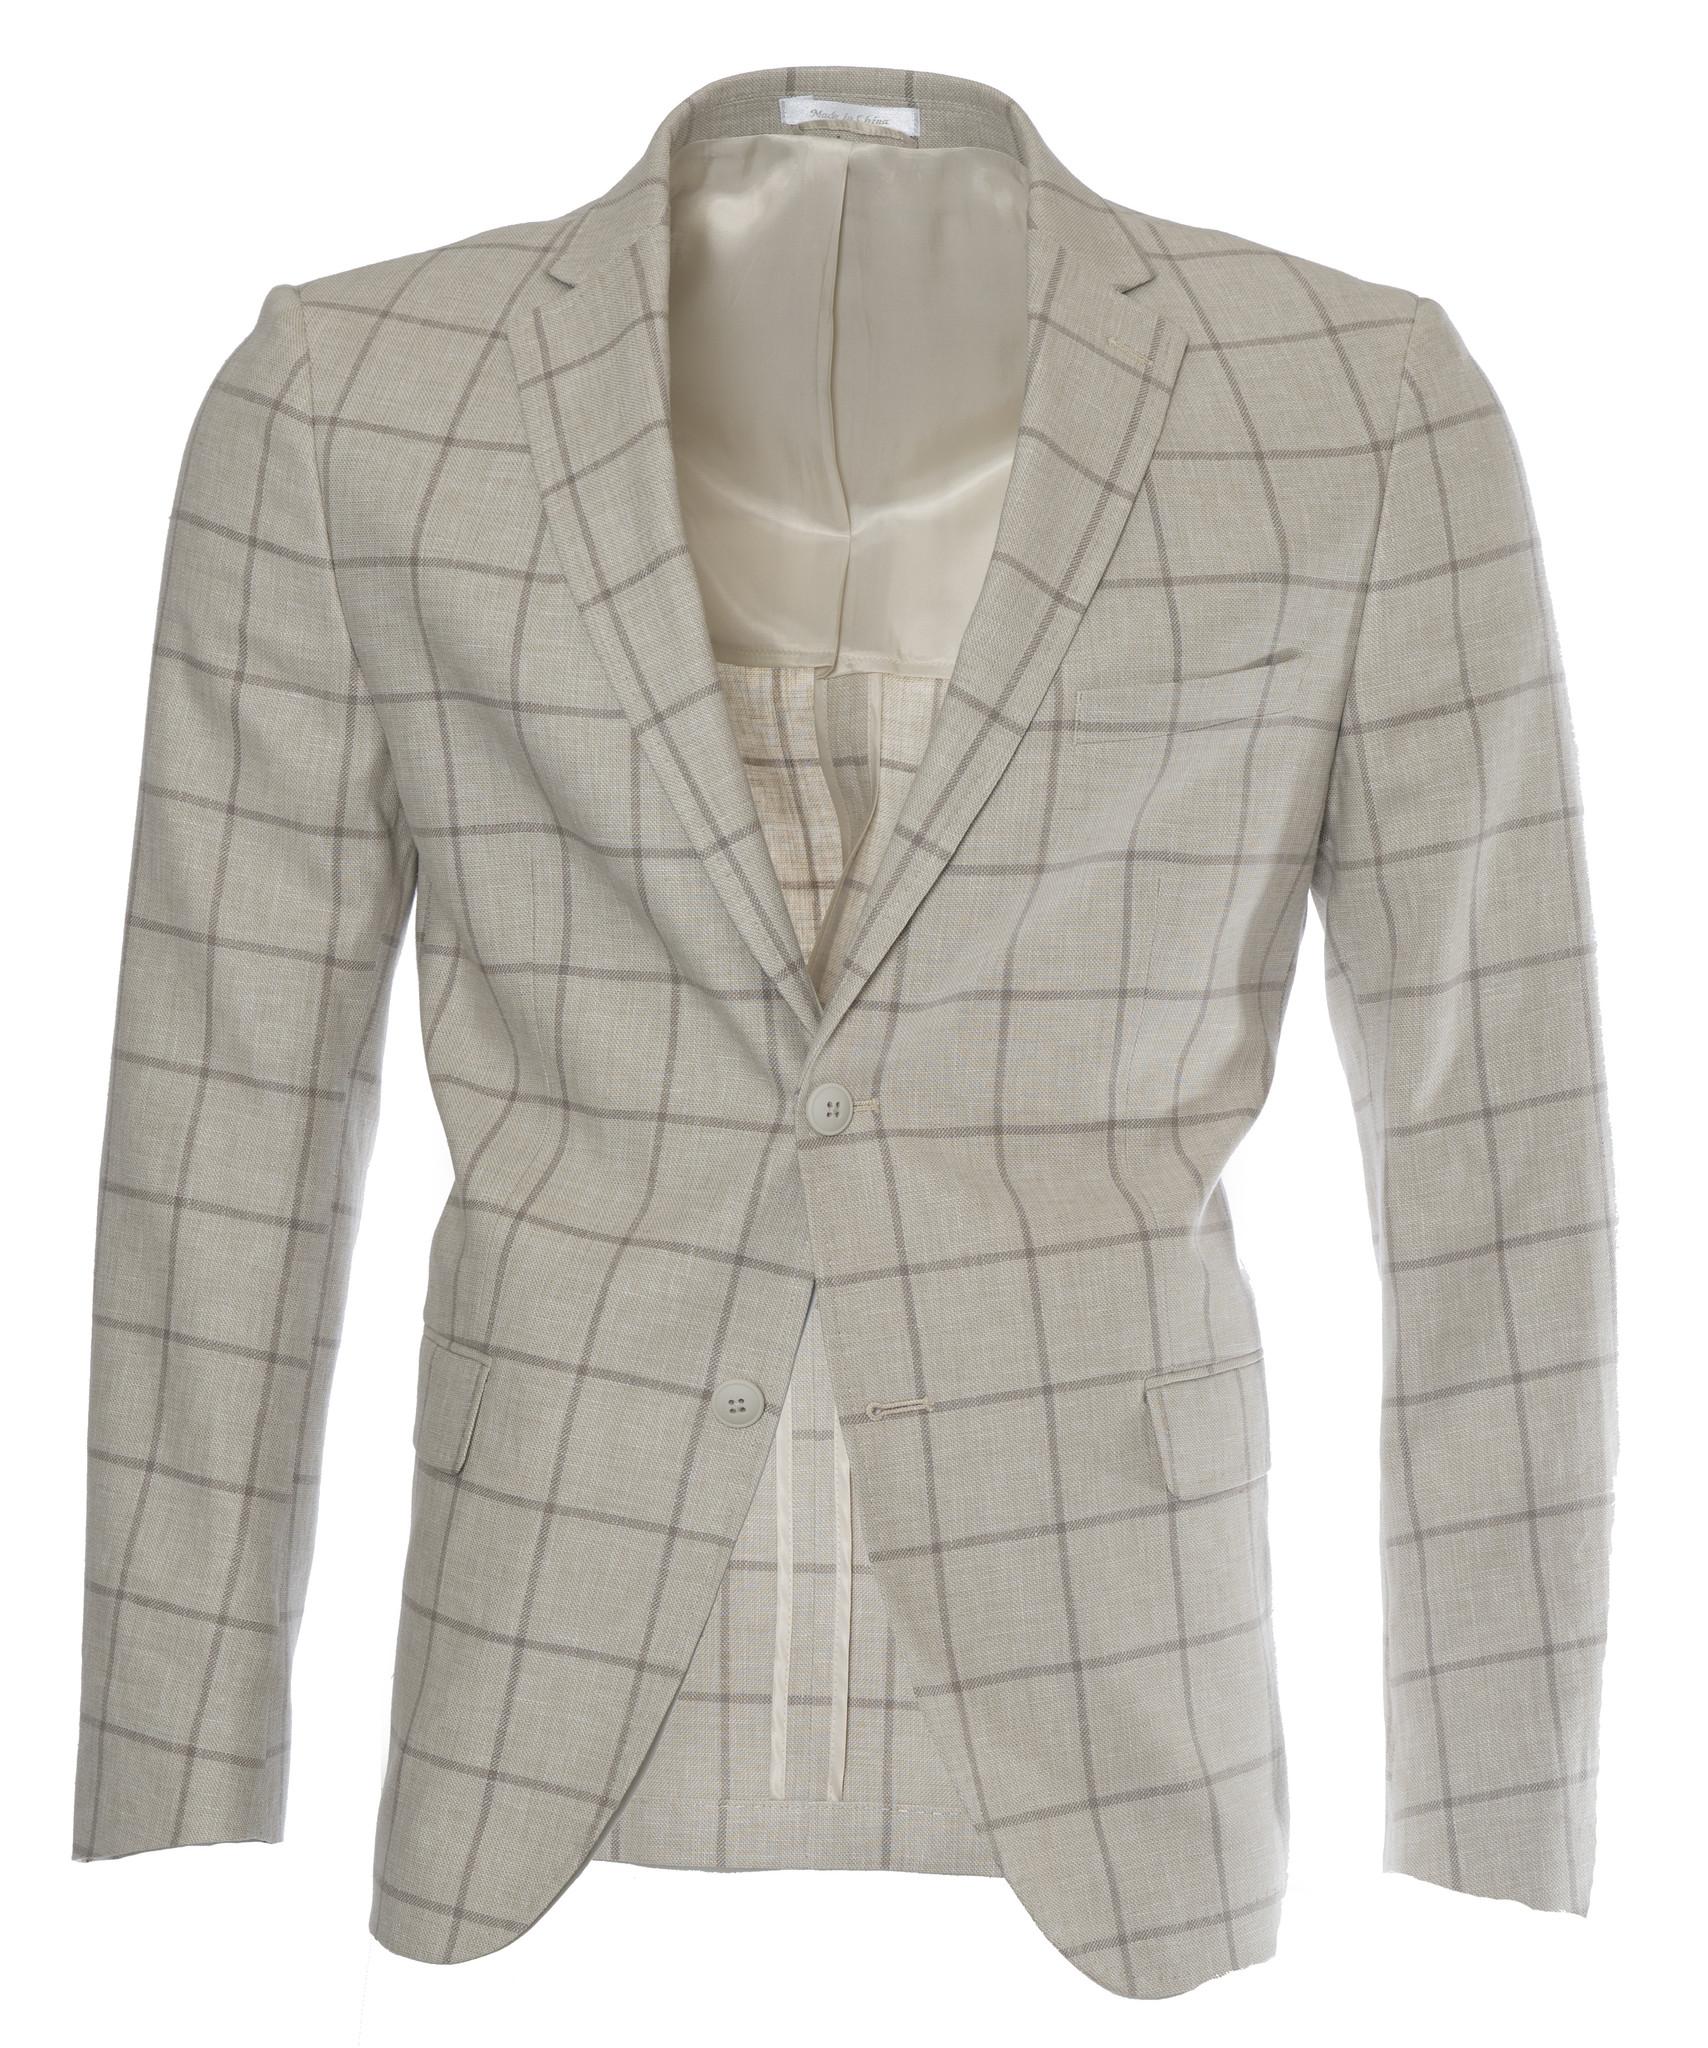 Calvin Klein -Jacket-7AY0240